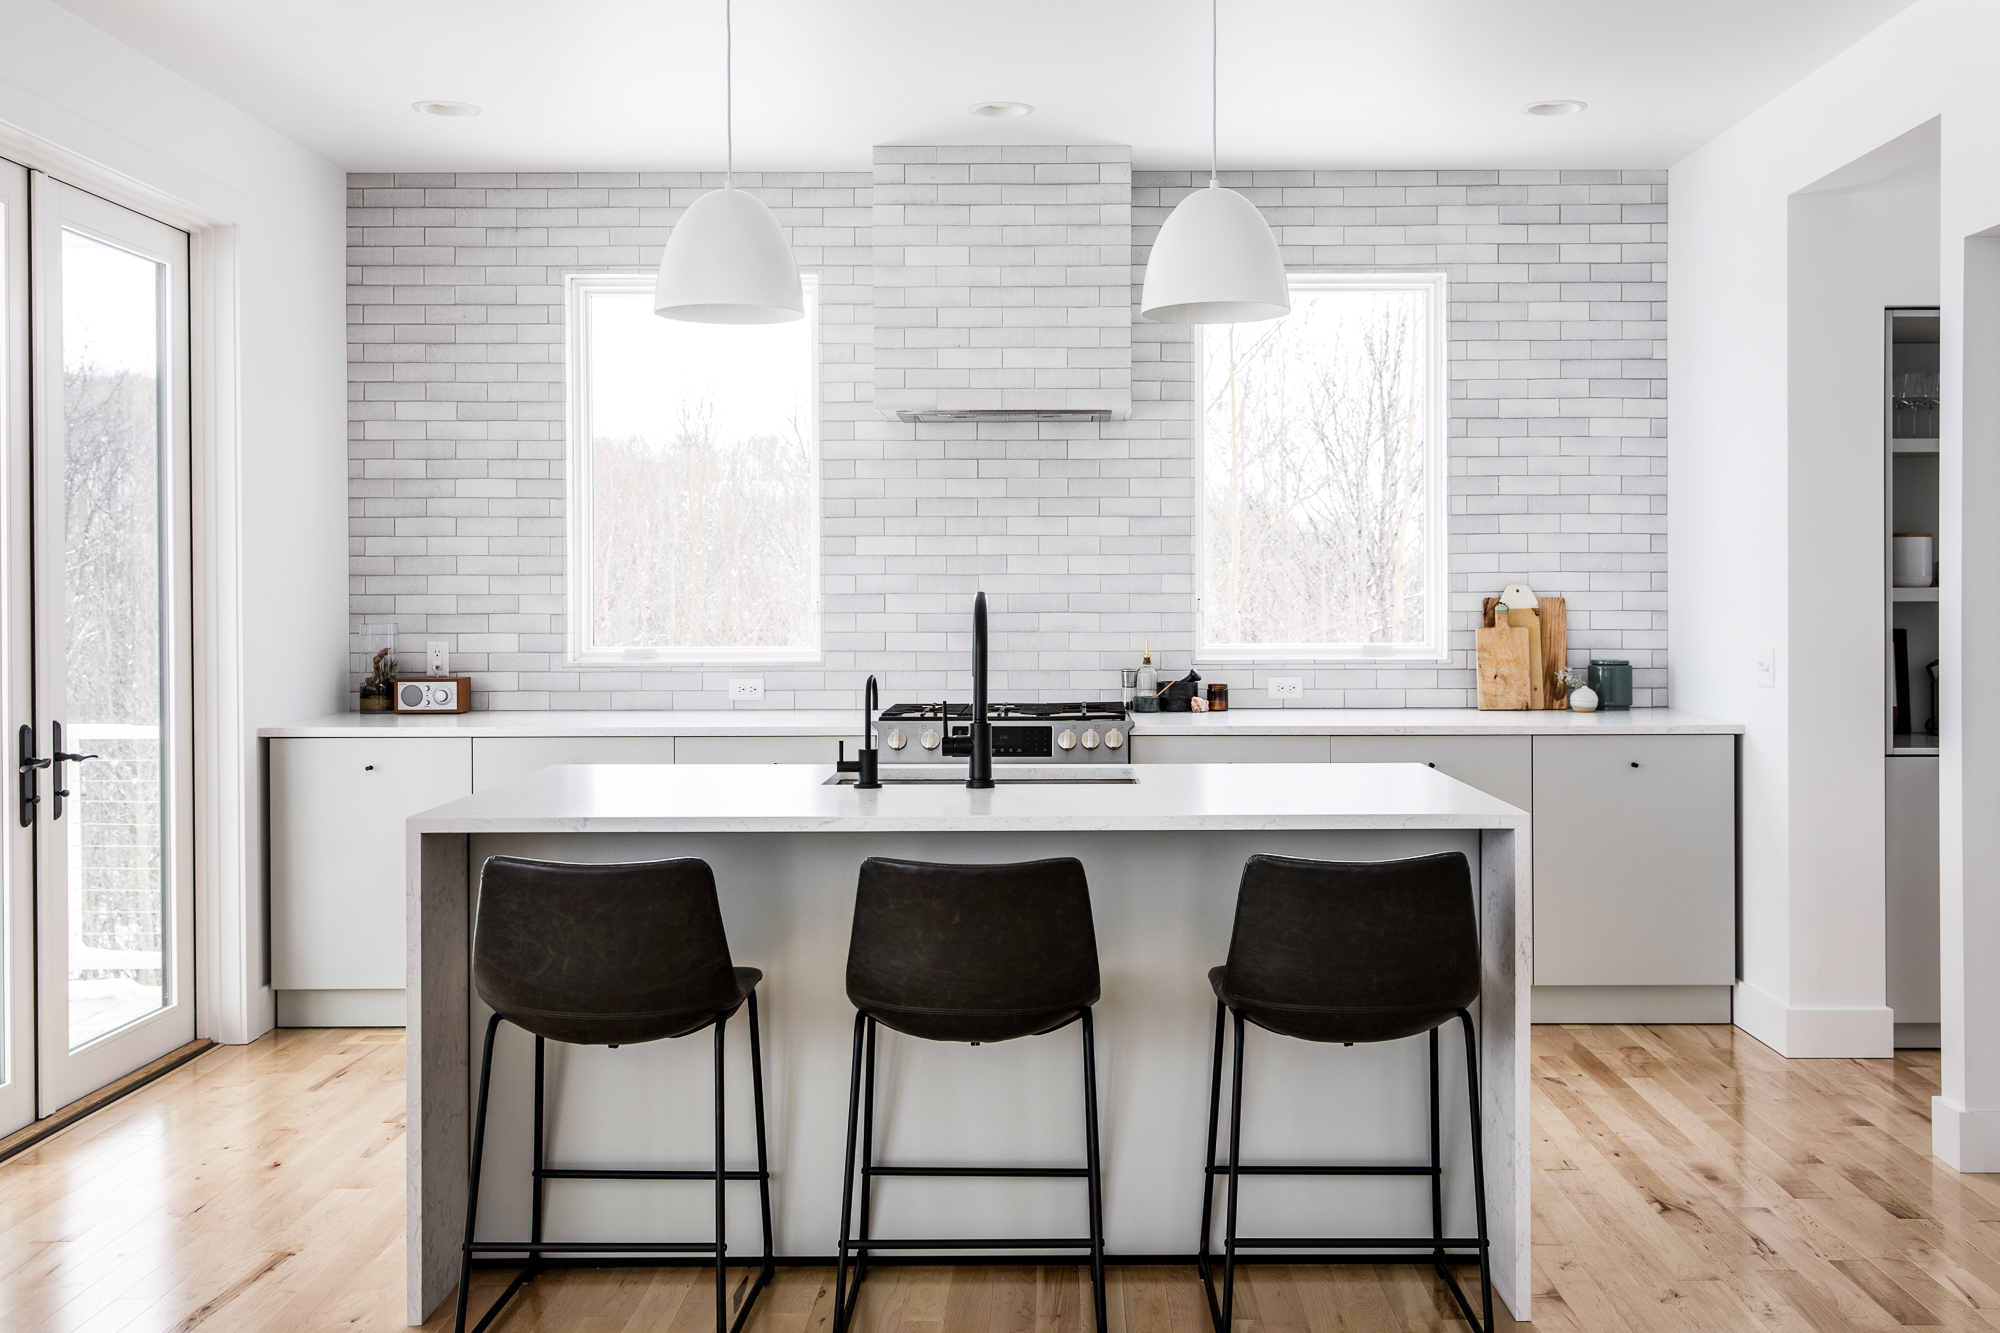 2018_Q1_image_residential_influencer_Fresh_Exchange_kitchen_backsplash_brick_cotton_full.jpg